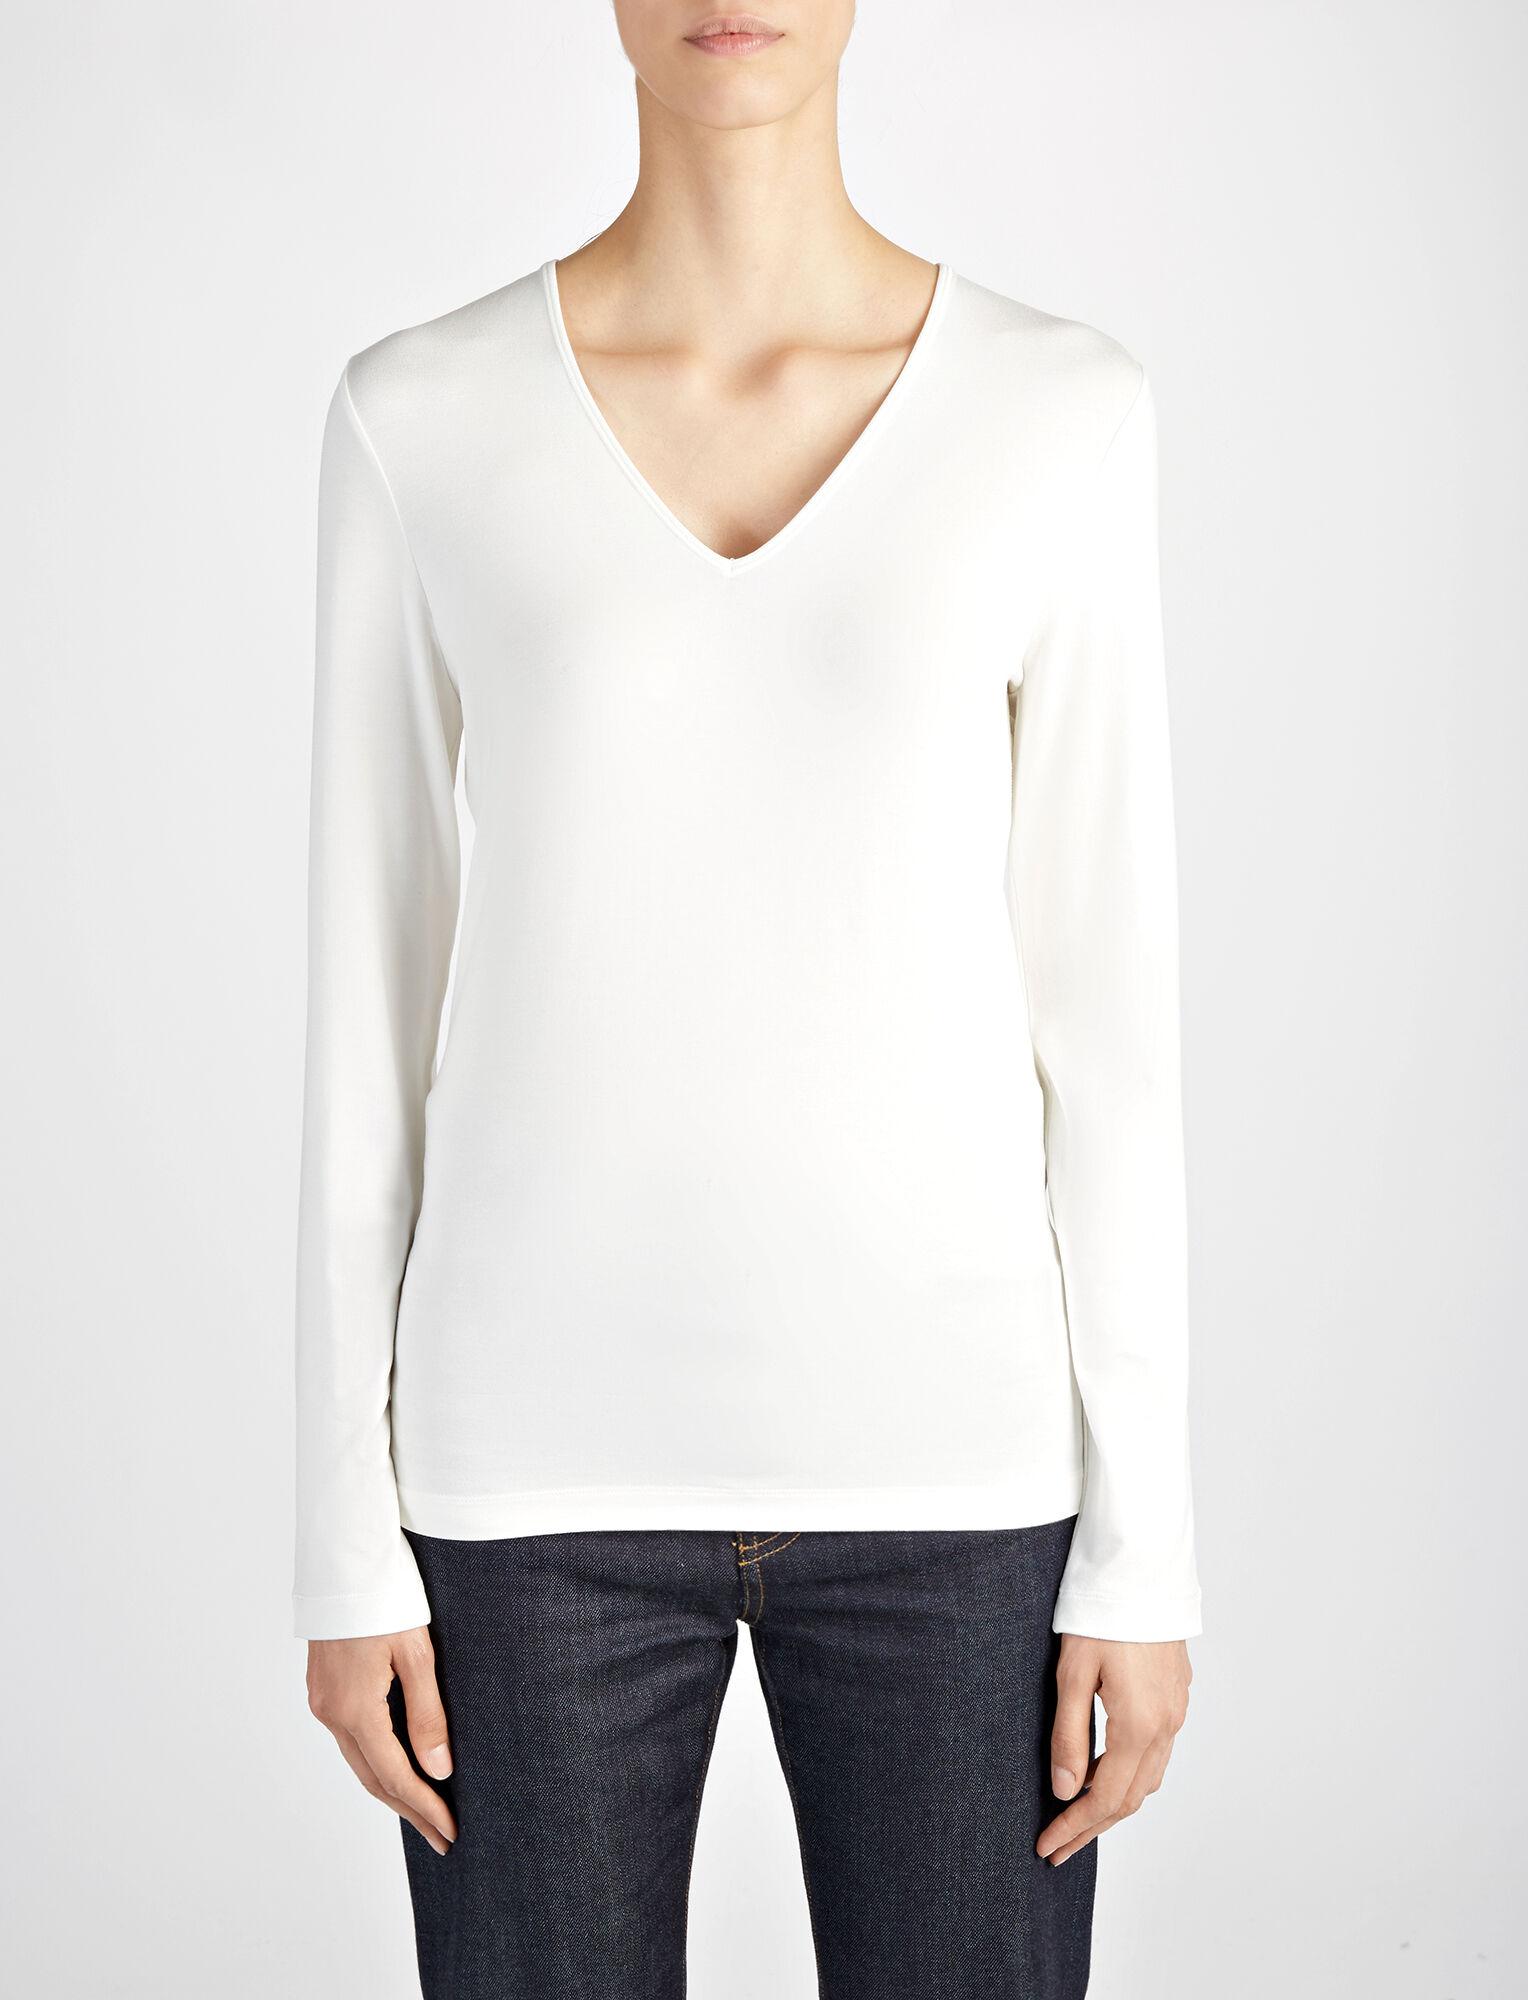 v-neck longsleeved T-shirt - White Joseph Free Shipping From China Clearance Get To Buy TSksGc